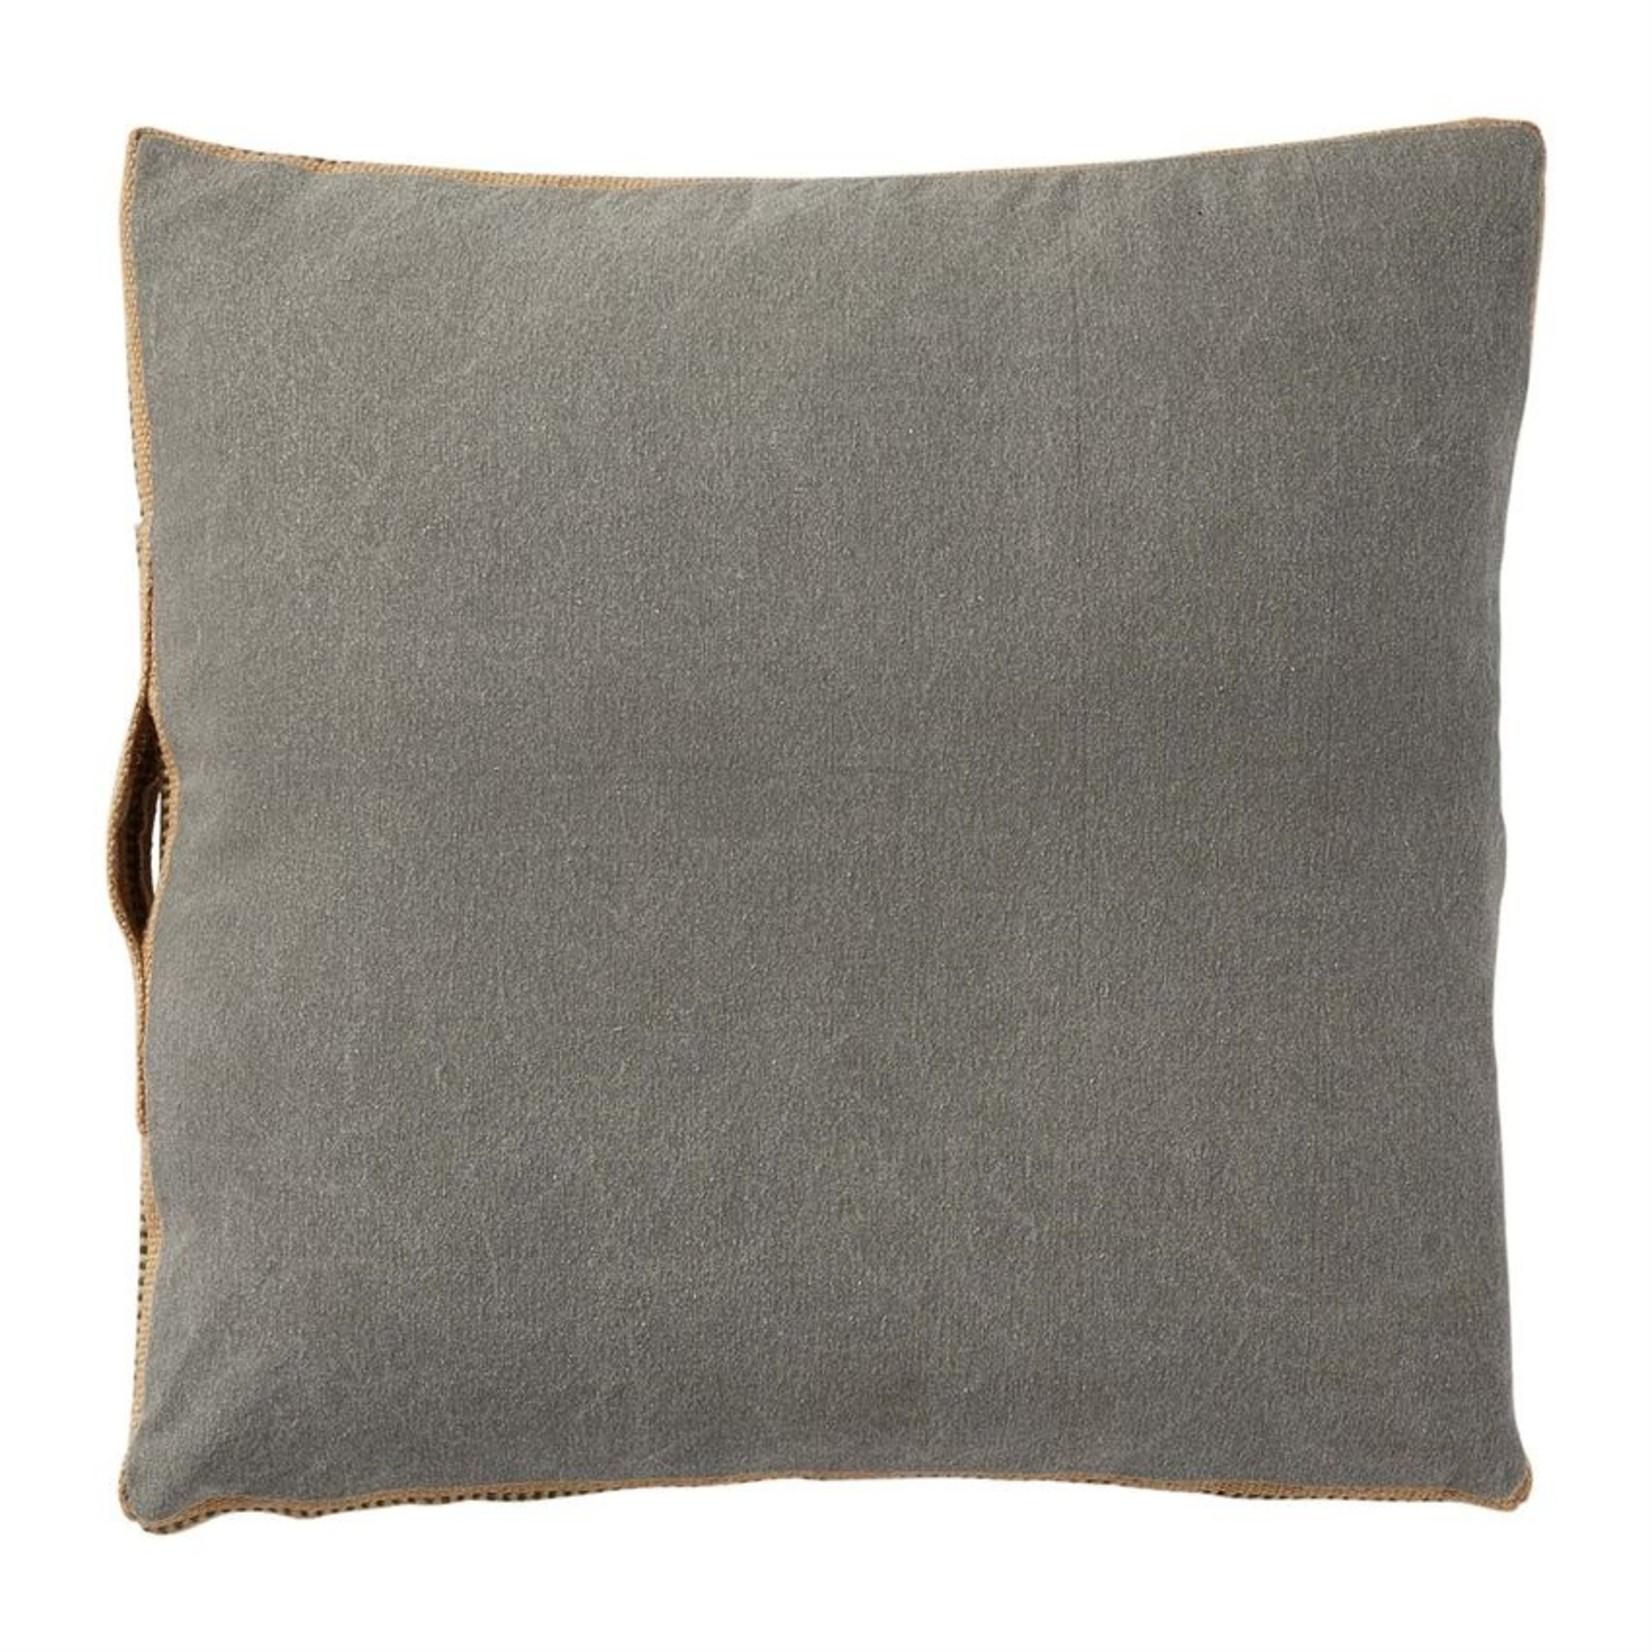 Mud Pie Gray Jute Webbing Pillow